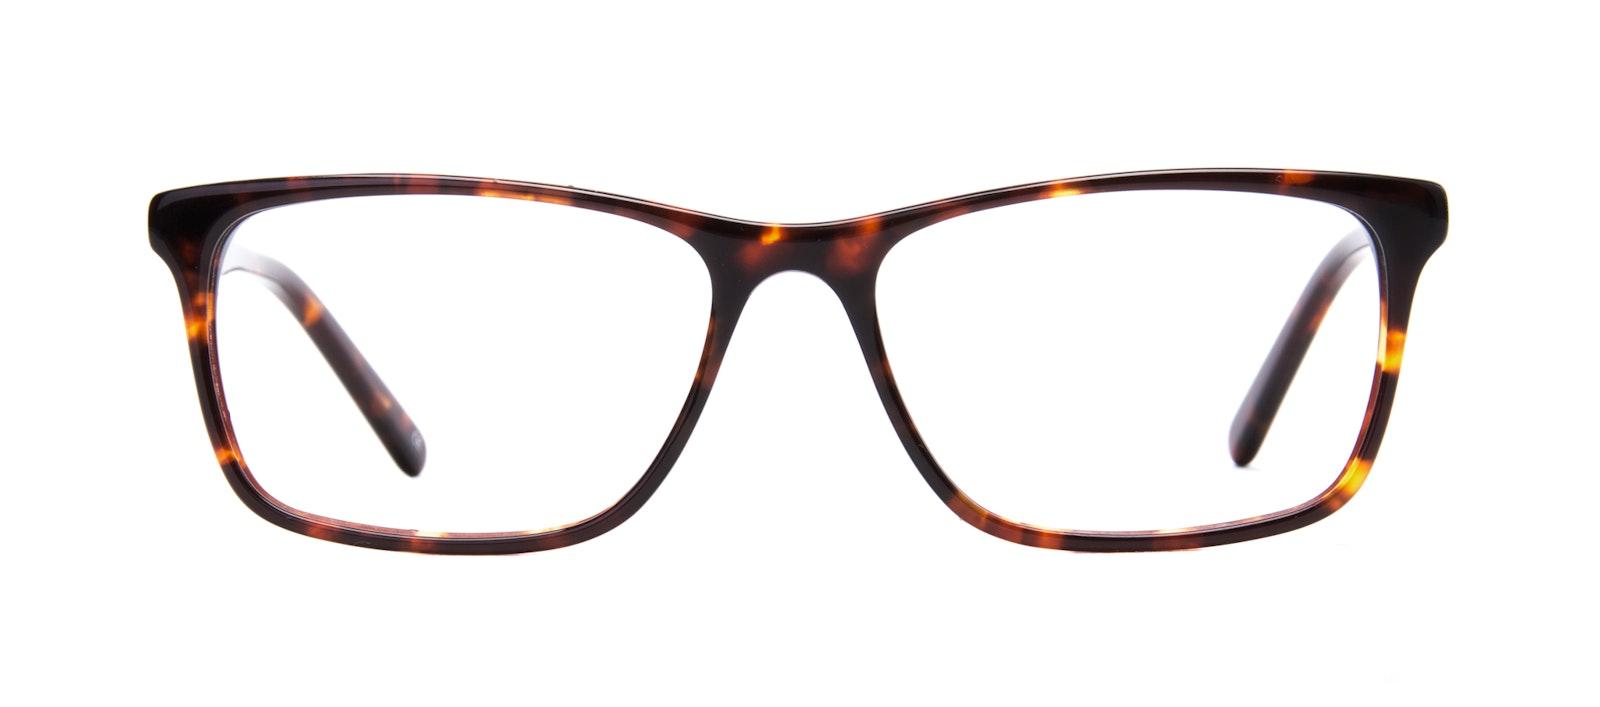 Affordable Fashion Glasses Rectangle Eyeglasses Men Henri Sepia Kiss Front